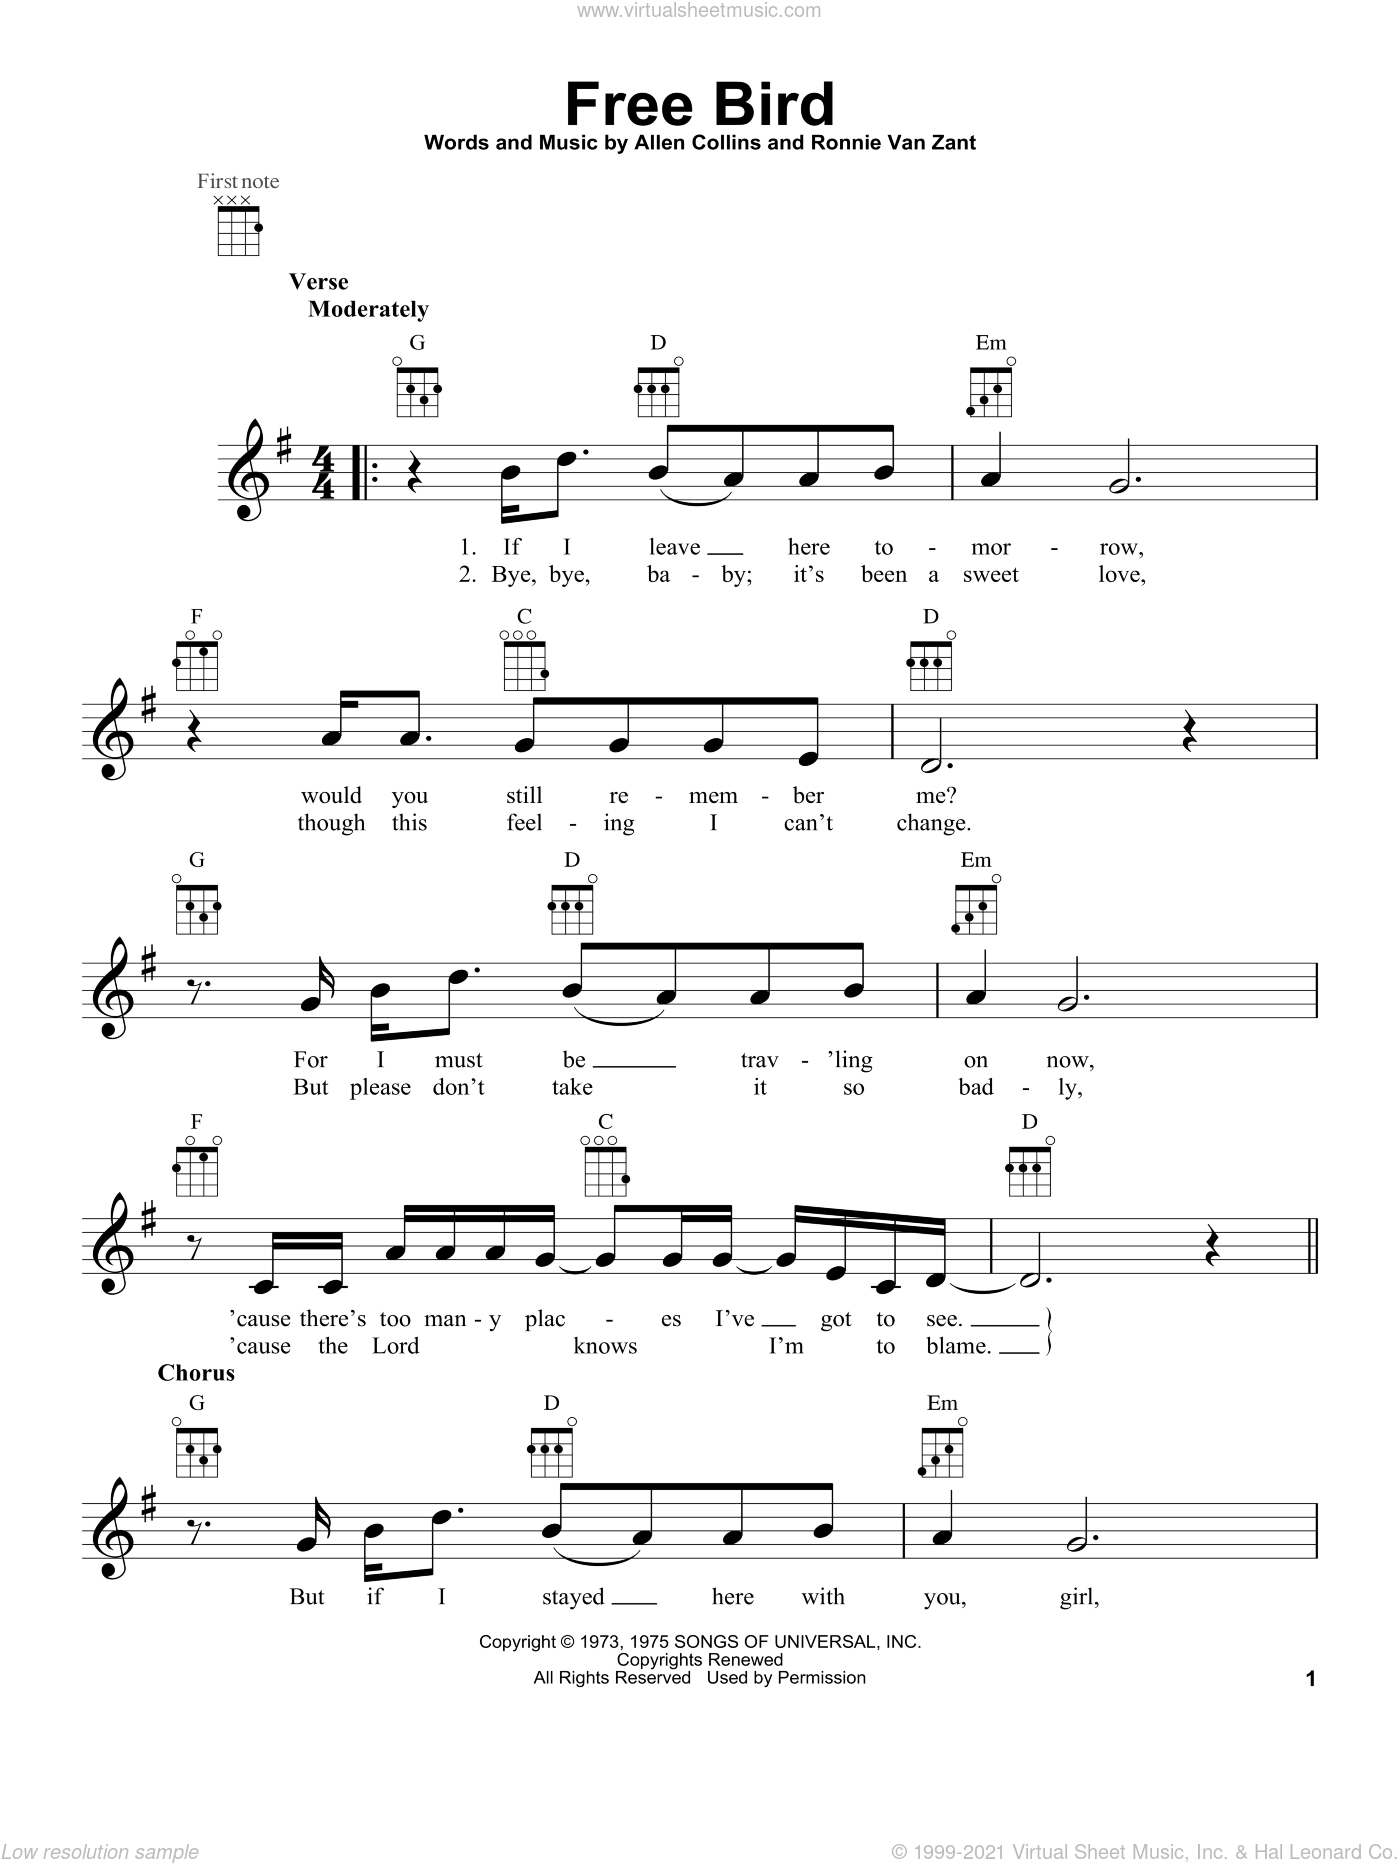 Free Bird sheet music for ukulele by Lynyrd Skynyrd, intermediate skill level